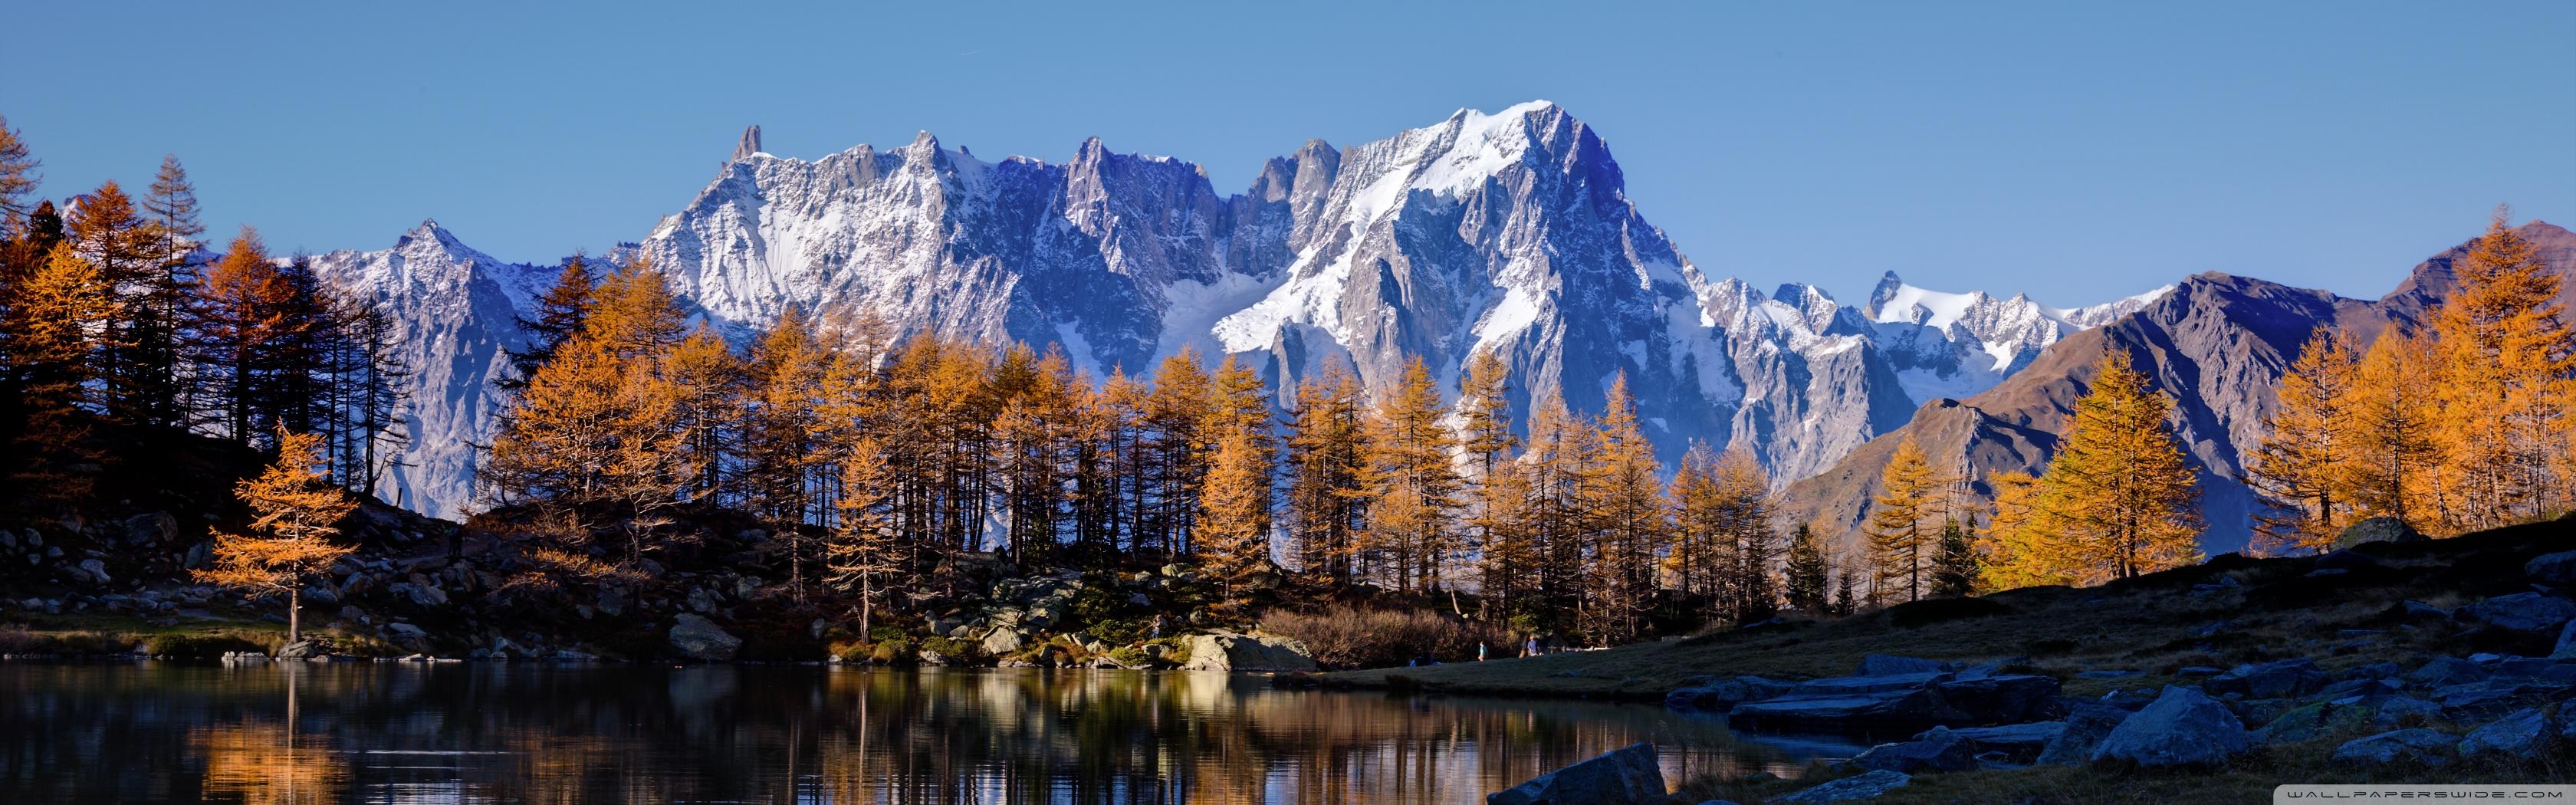 Fall Wallpaper 16 9 Mont Blanc Autumn 4k Hd Desktop Wallpaper For Dual